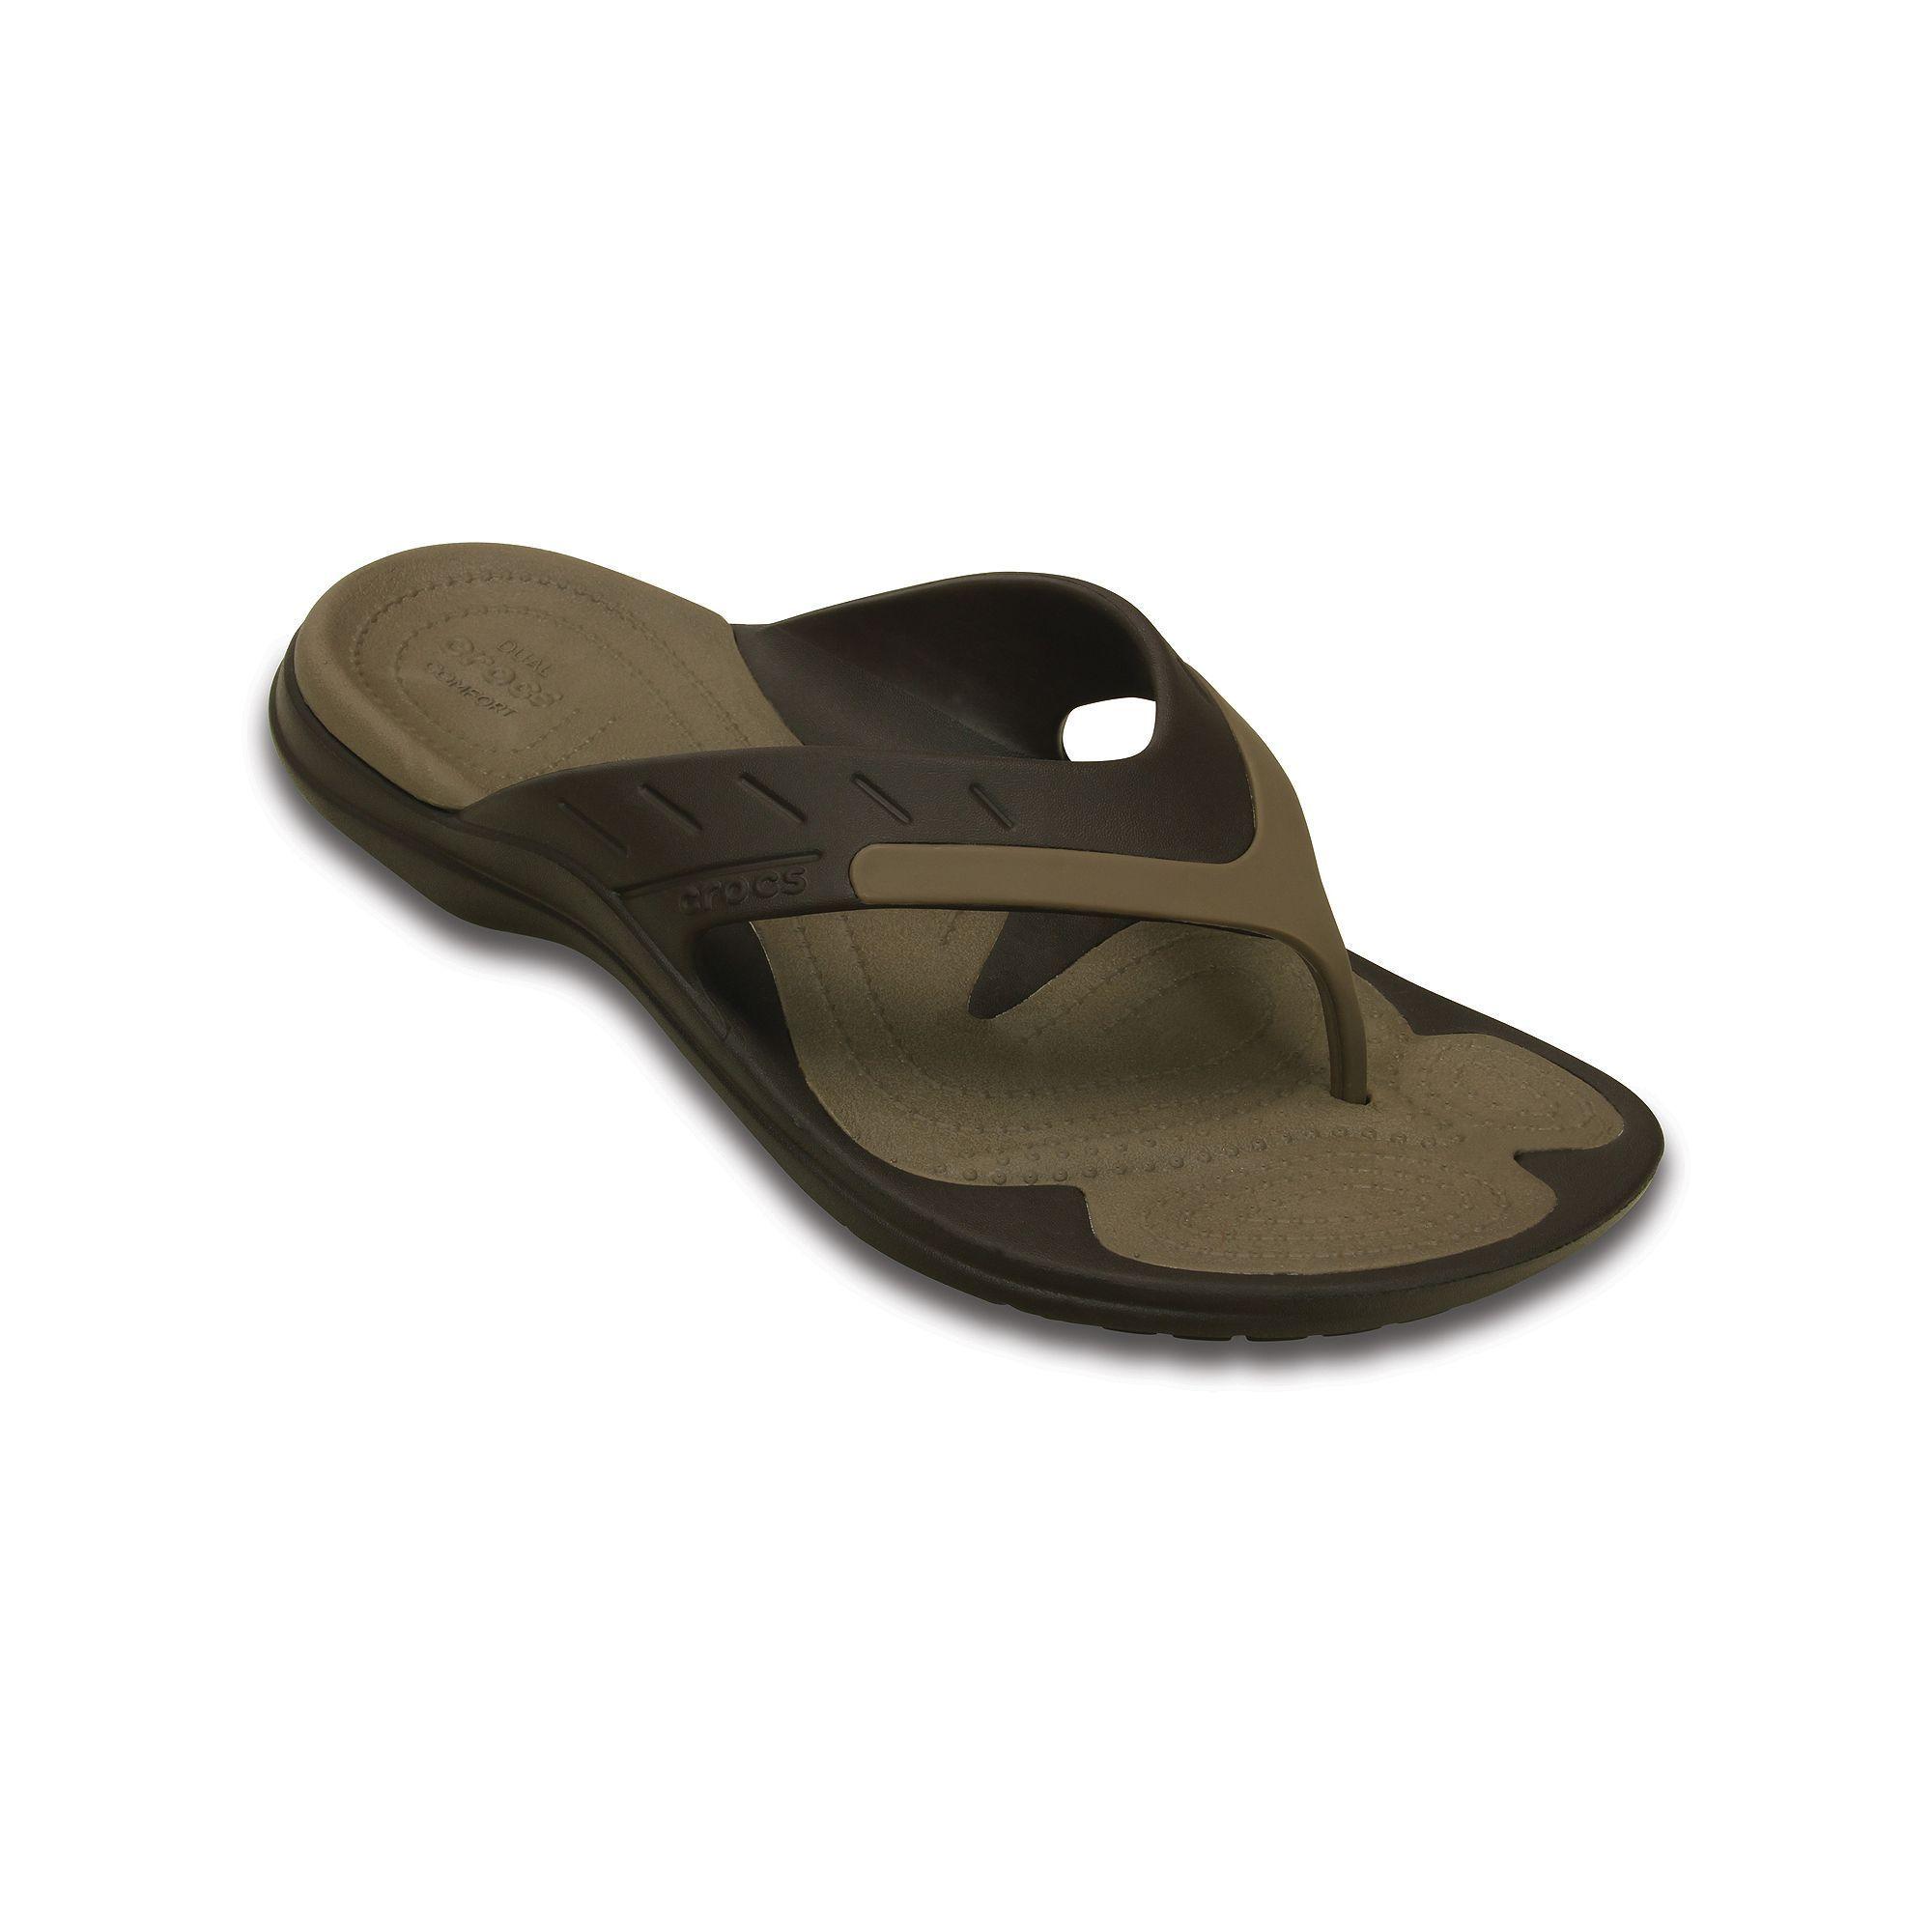 fånga köpa billigt stor rea Crocs MODI Men's Sport Flip-Flops | Mens flip flops, Flip flop ...